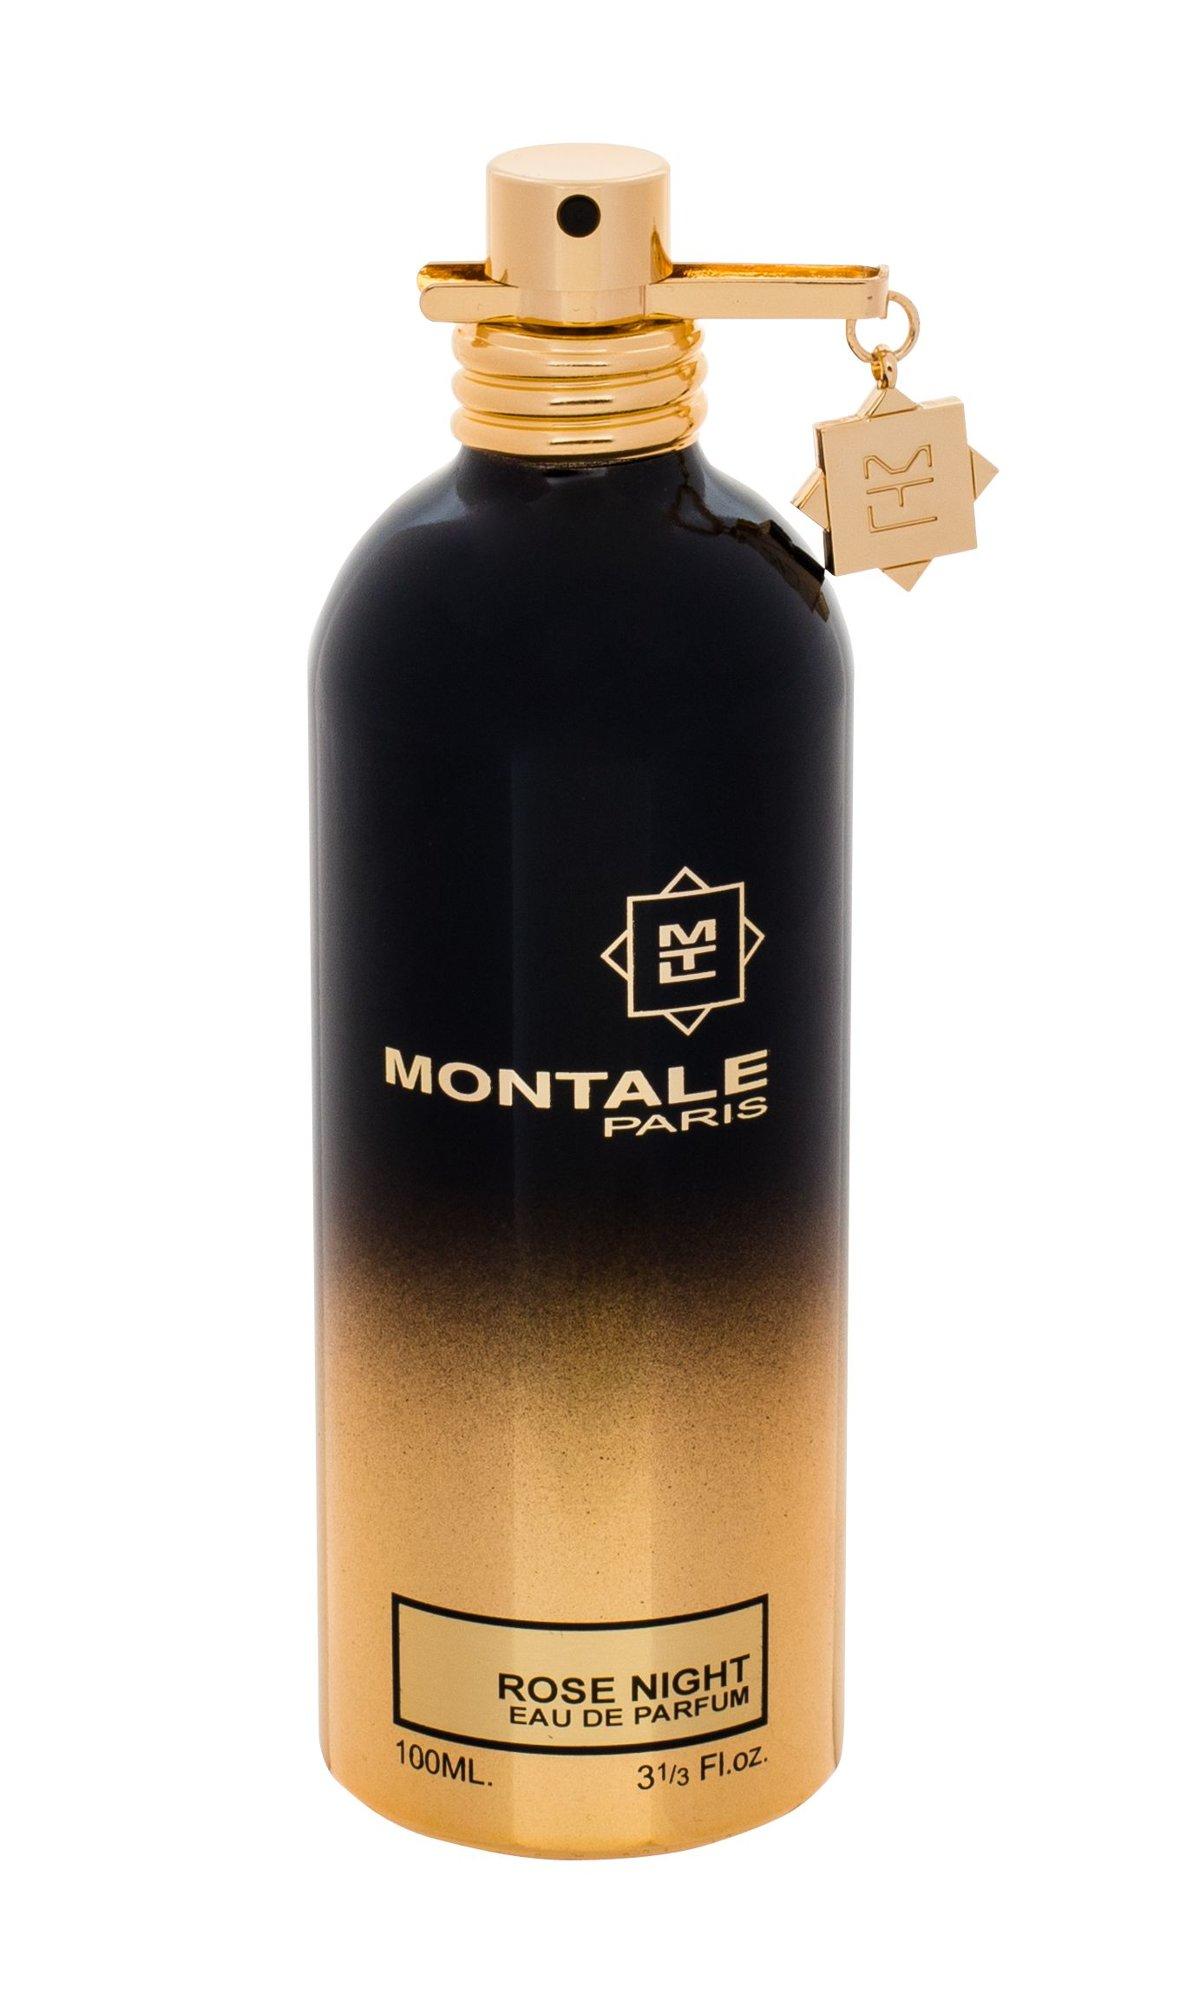 Montale Paris Rose Night EDP 100ml